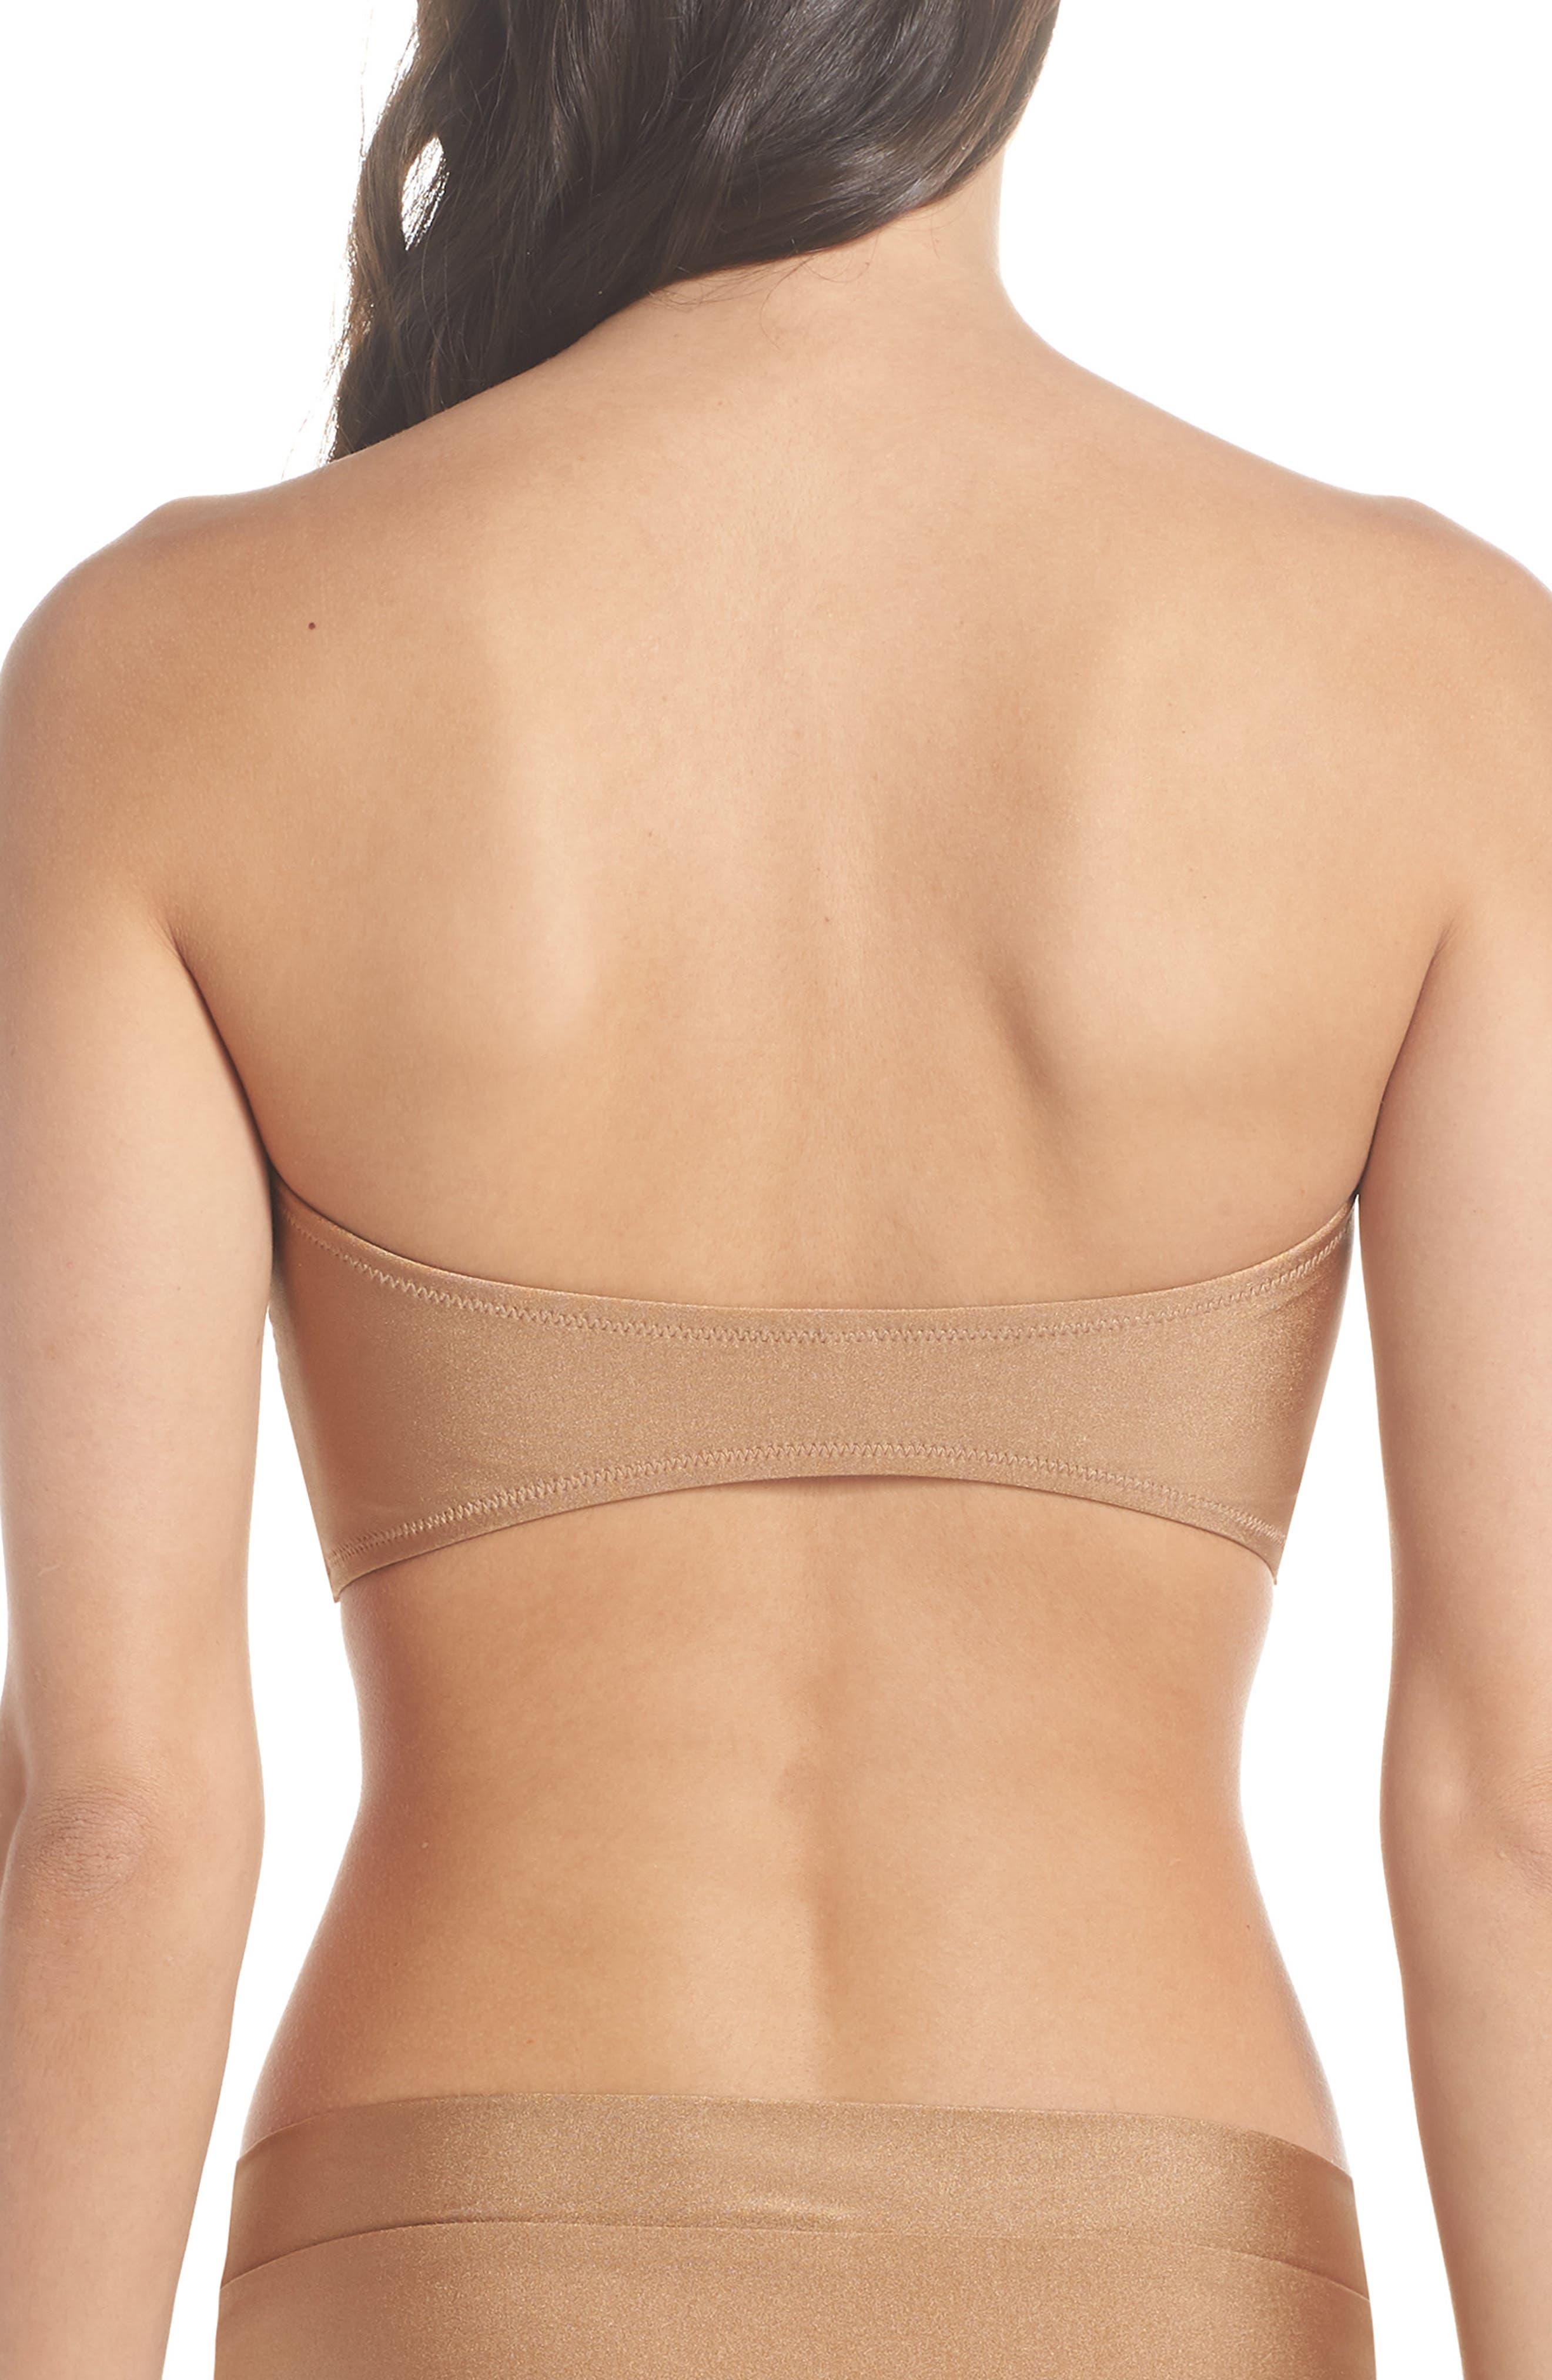 Fairfax Bandeau Bikini Top,                             Alternate thumbnail 2, color,                             710